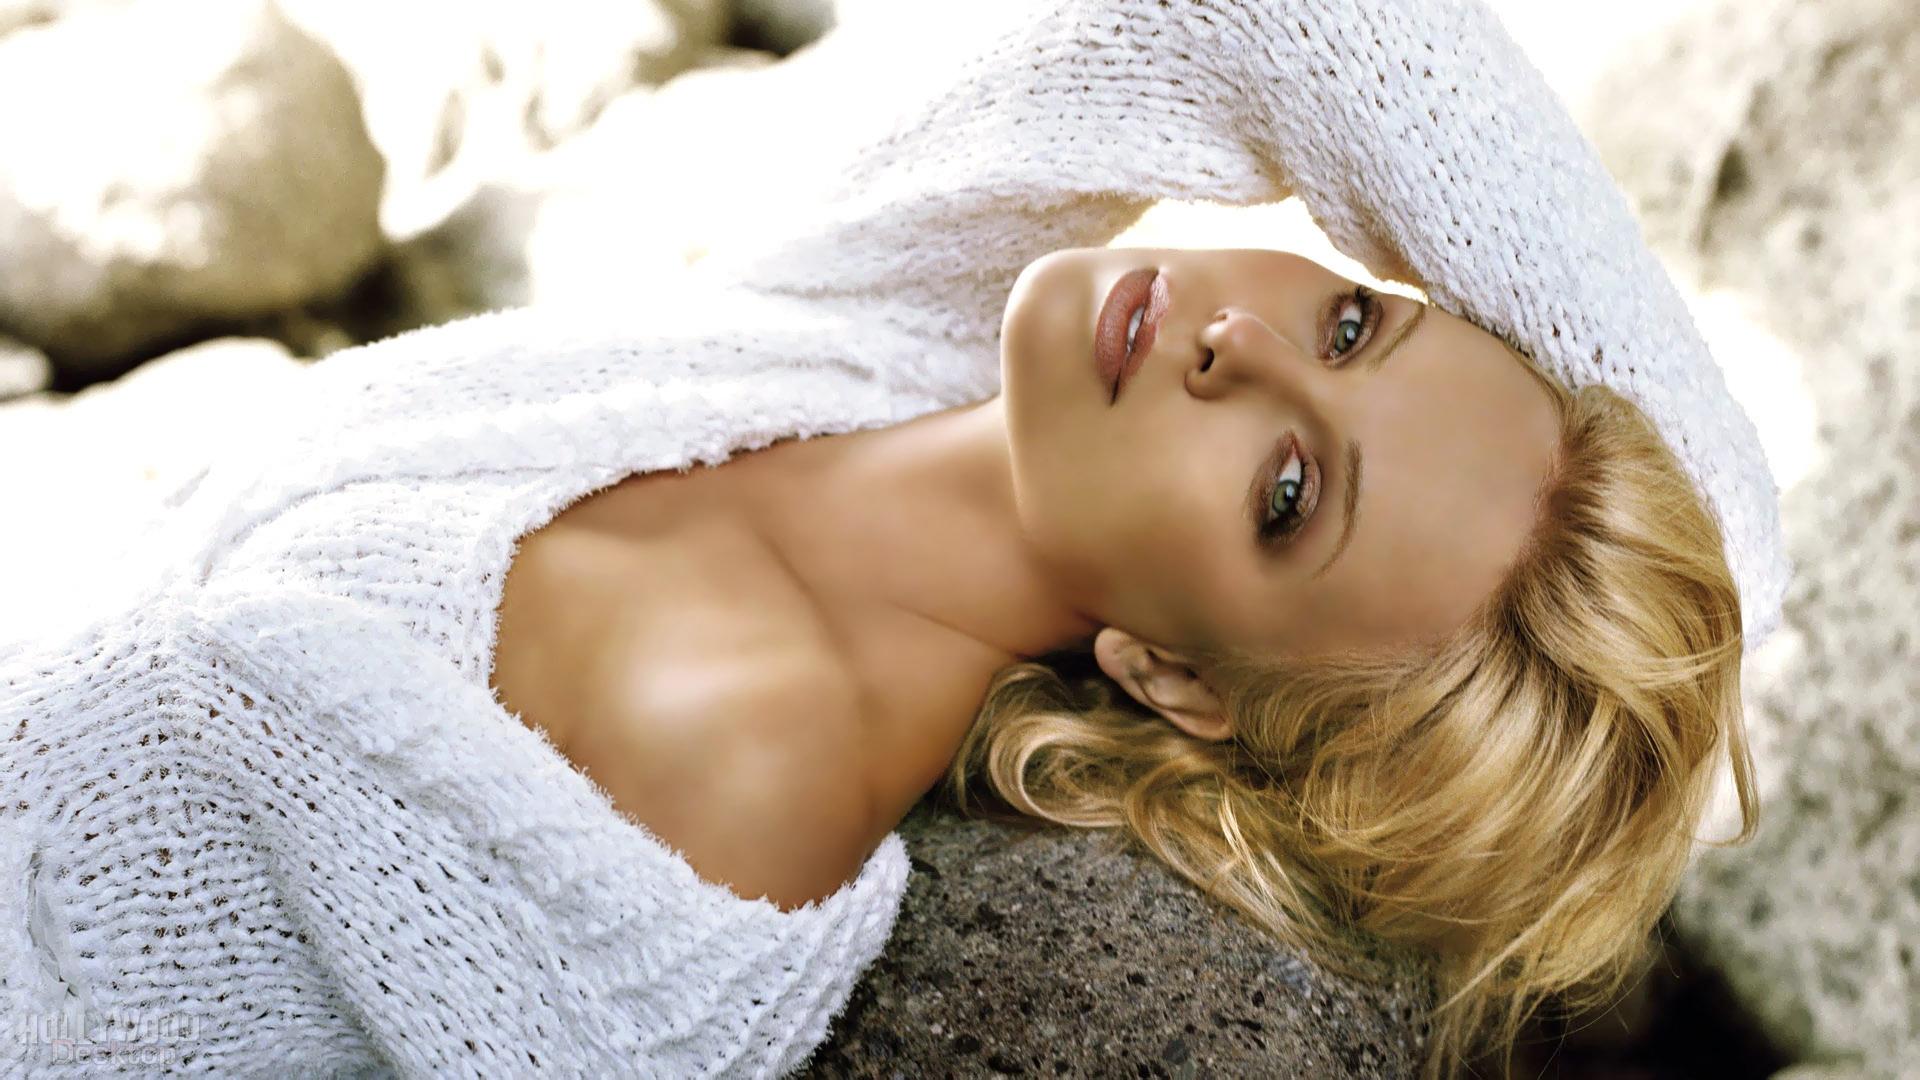 Charlize Theron 2012 wallpaper